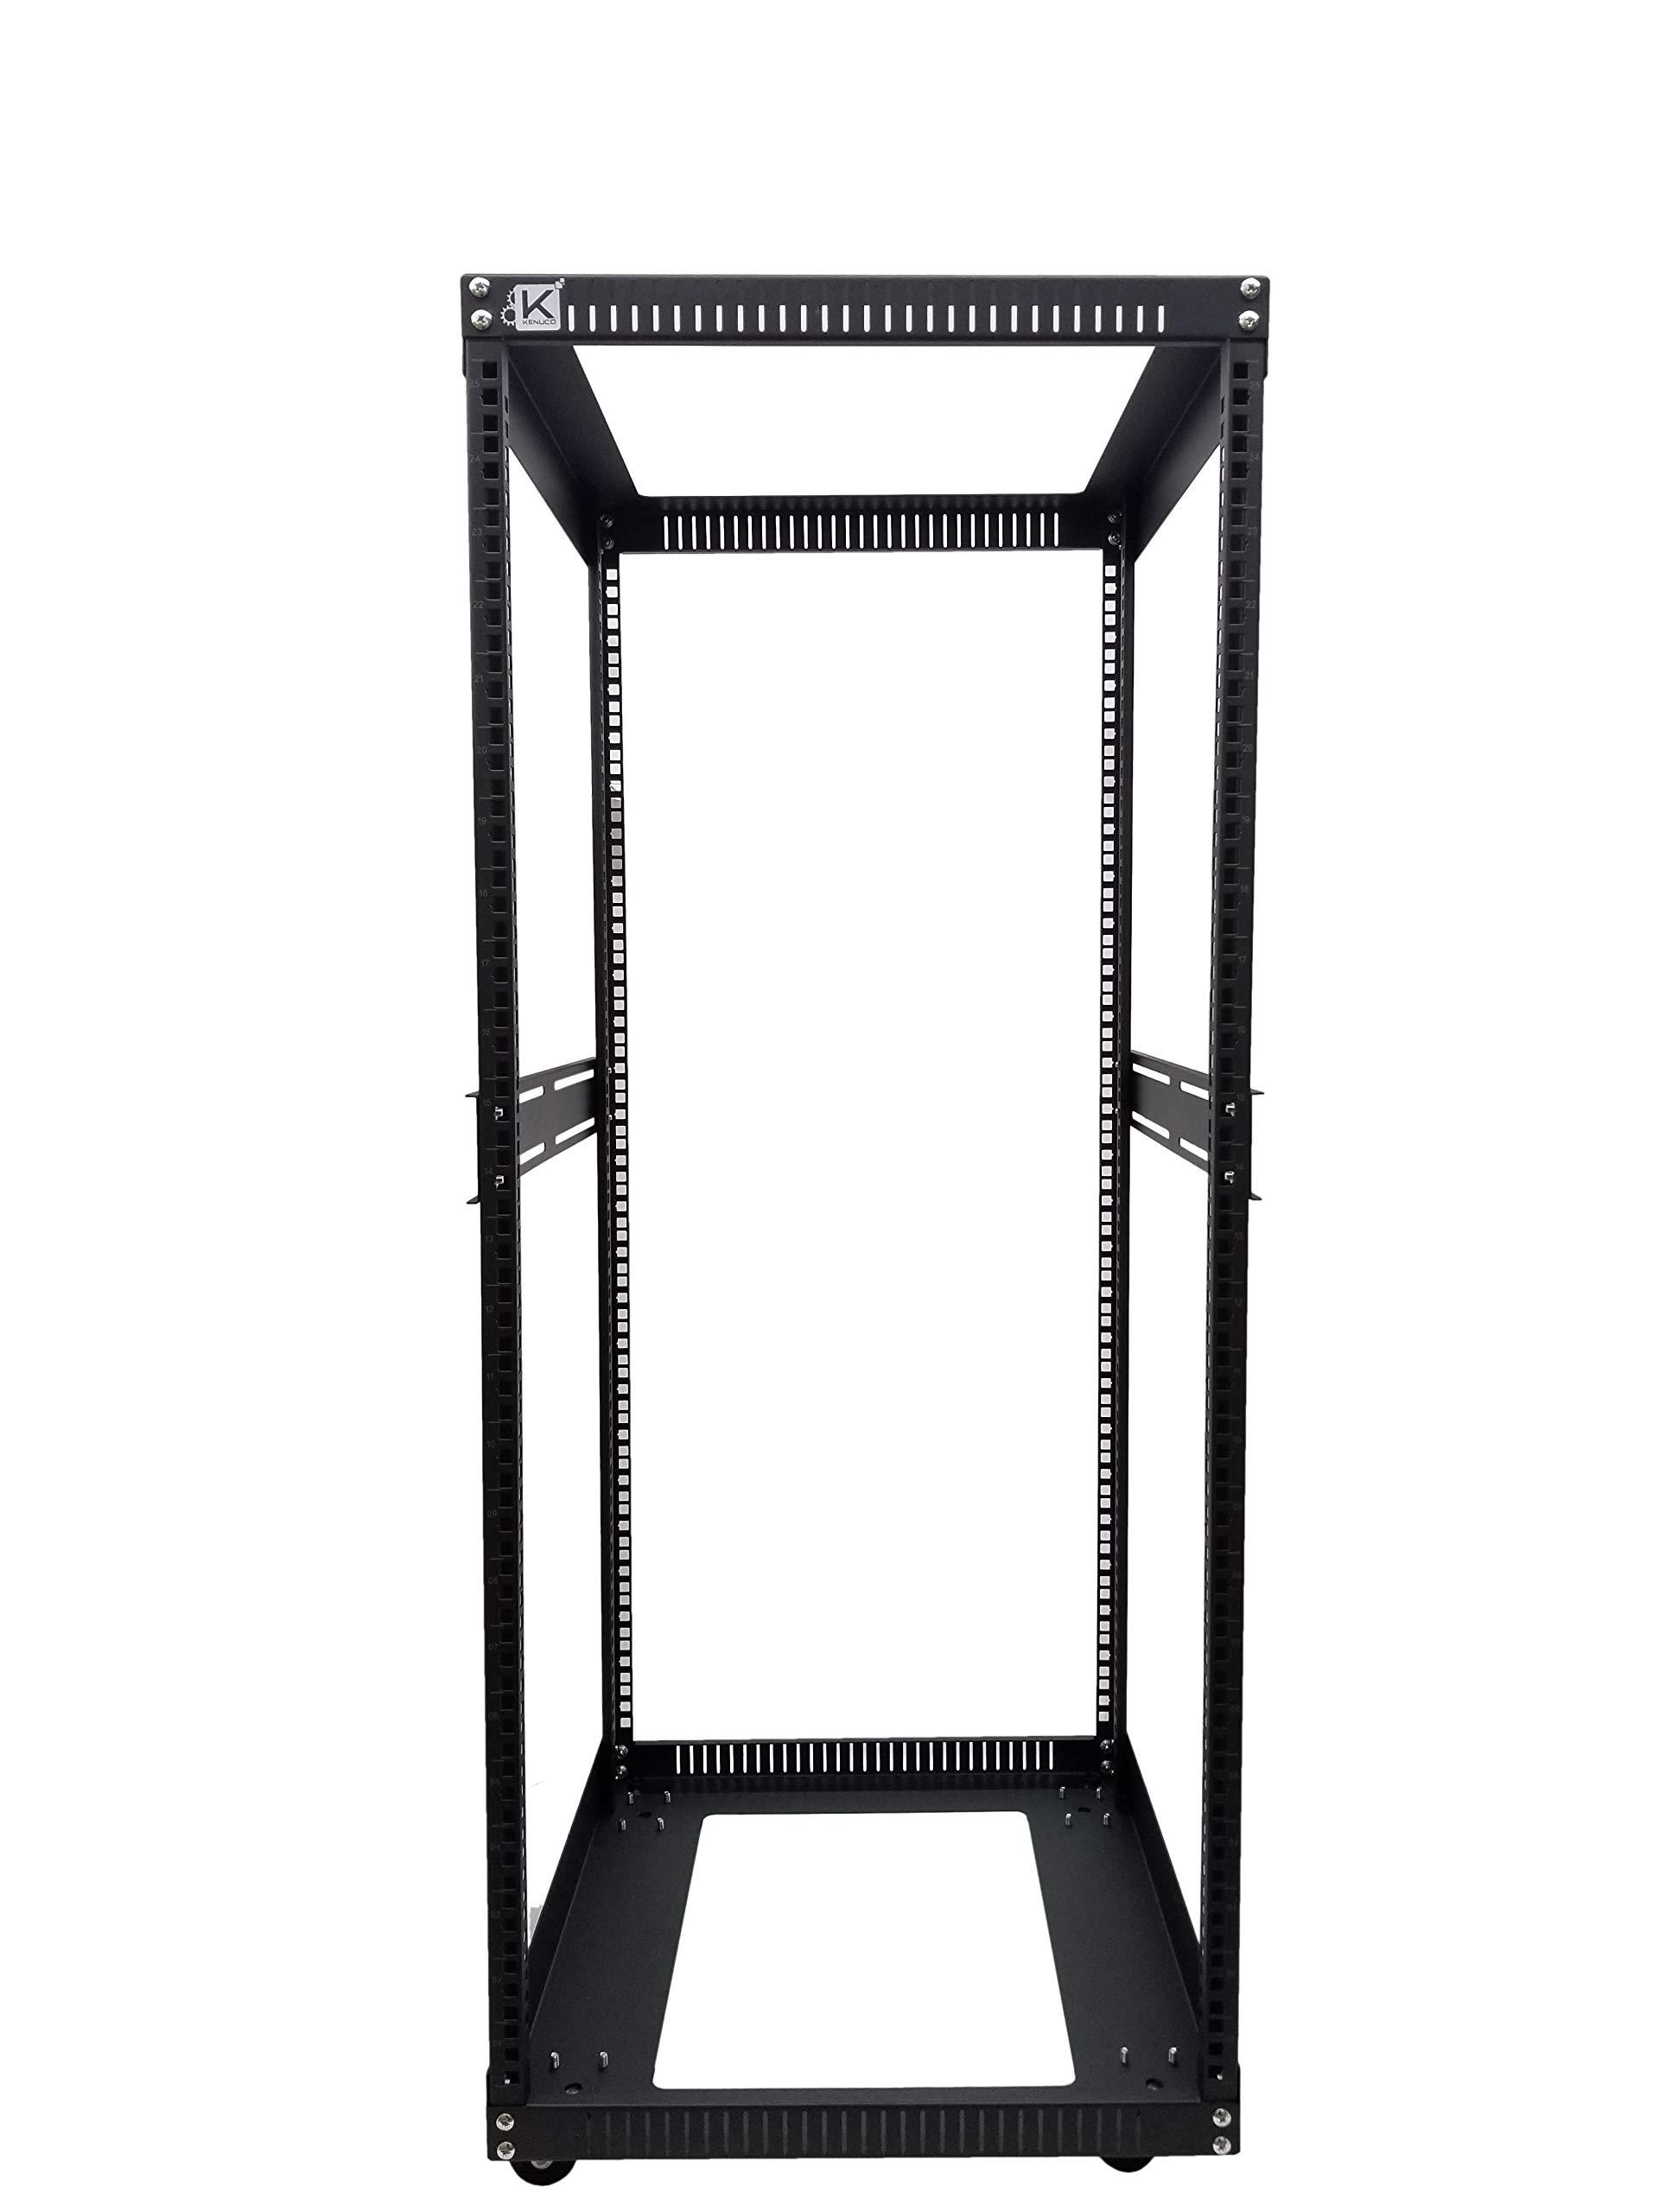 Kenuco 25U Standing Open Frame Rack with 4 Wheels and 4 Legs - Steel Network Equipment Rack 17.75 Inch Deep